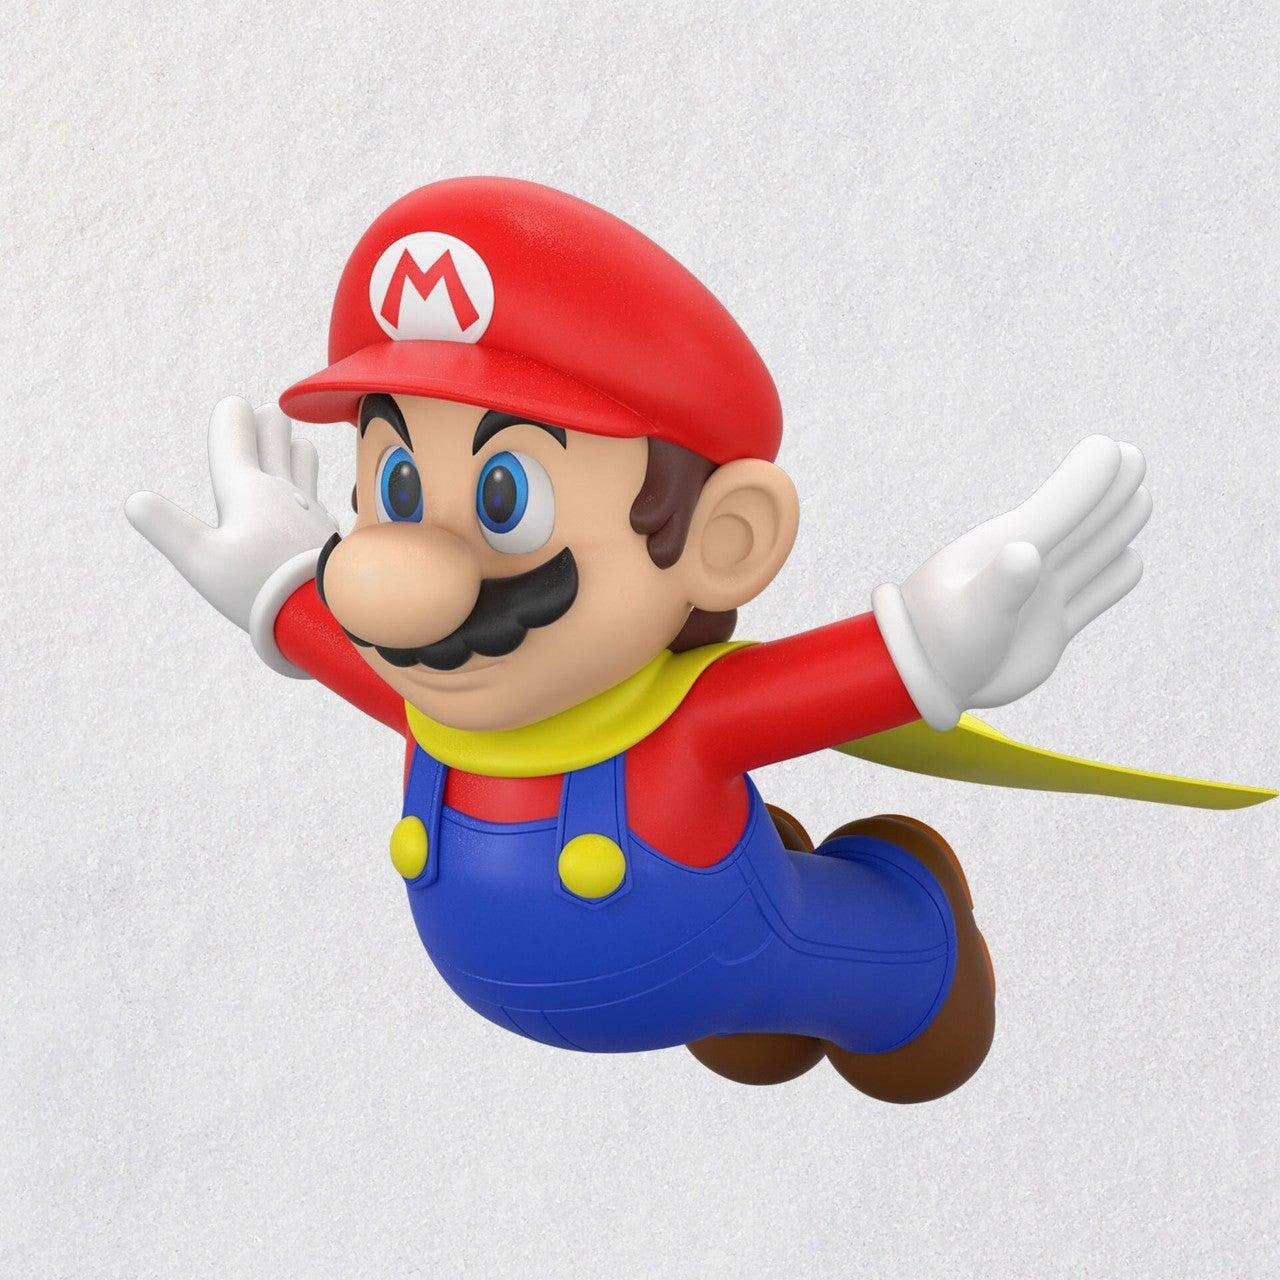 Nintendo-Caped-Mario-Keepsake-Ornament_1799QXI7422_01